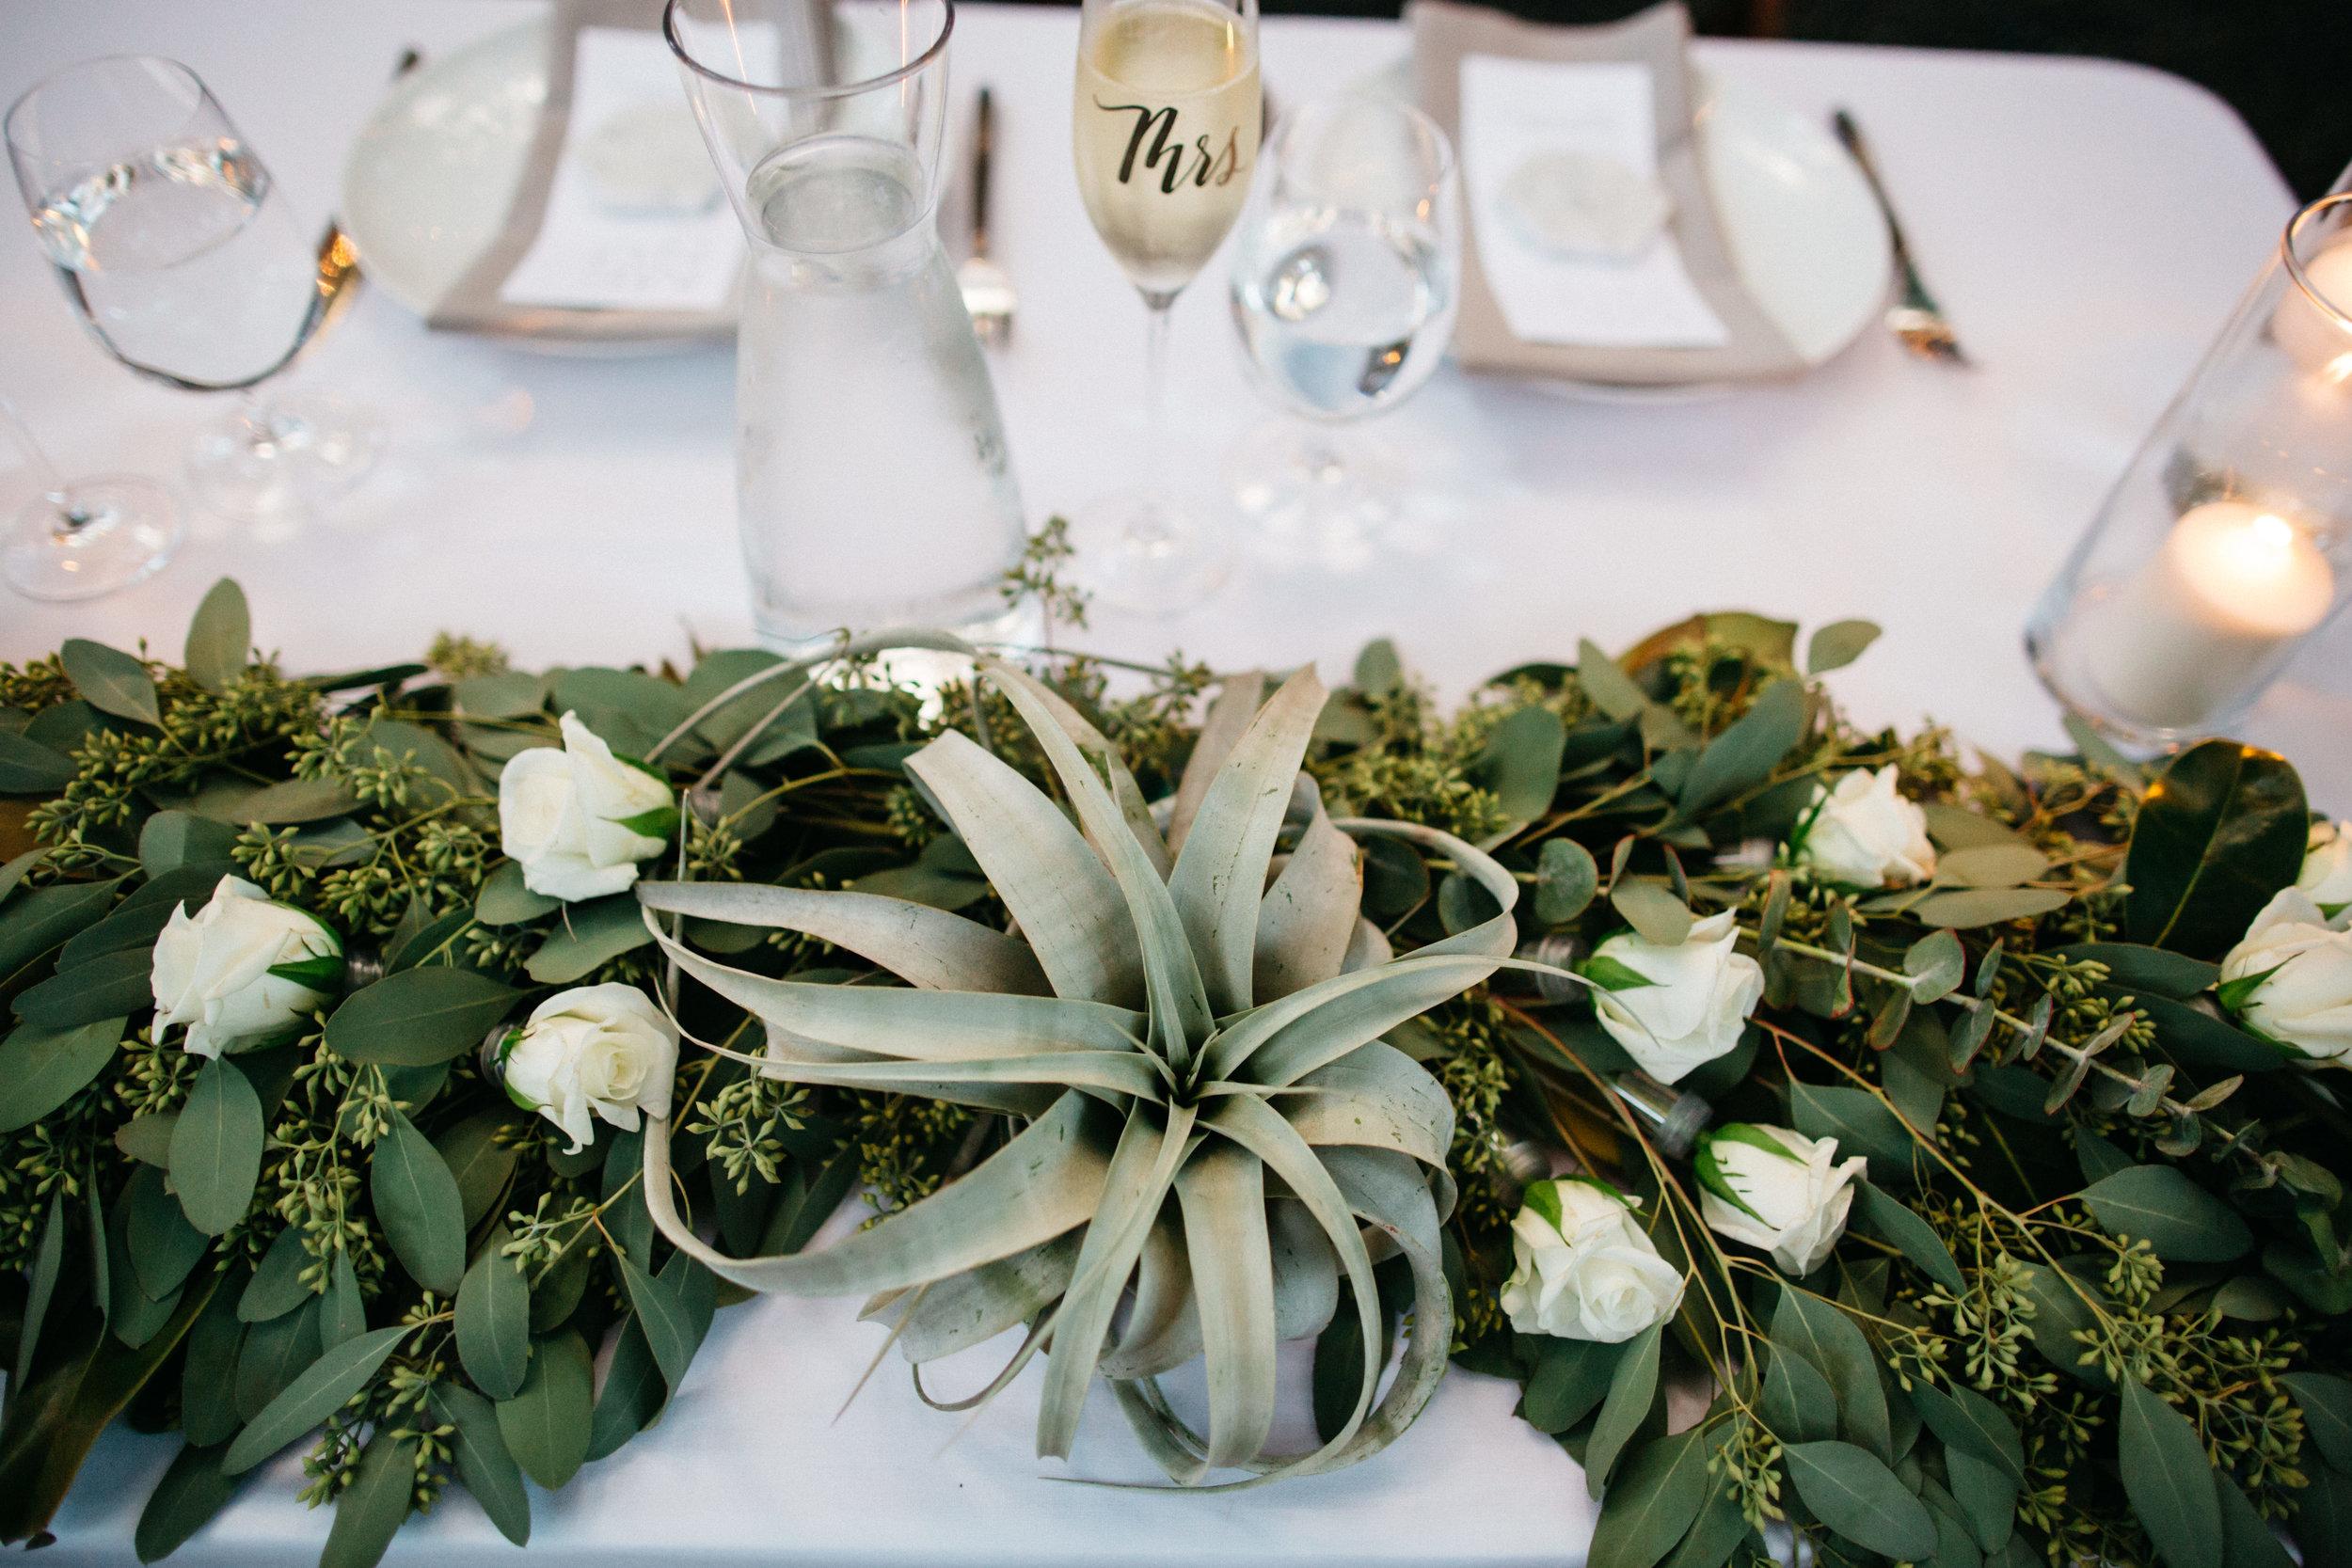 sweet_and_crafty_jocelyn_domingo_wedding_portfolio_105.jpg